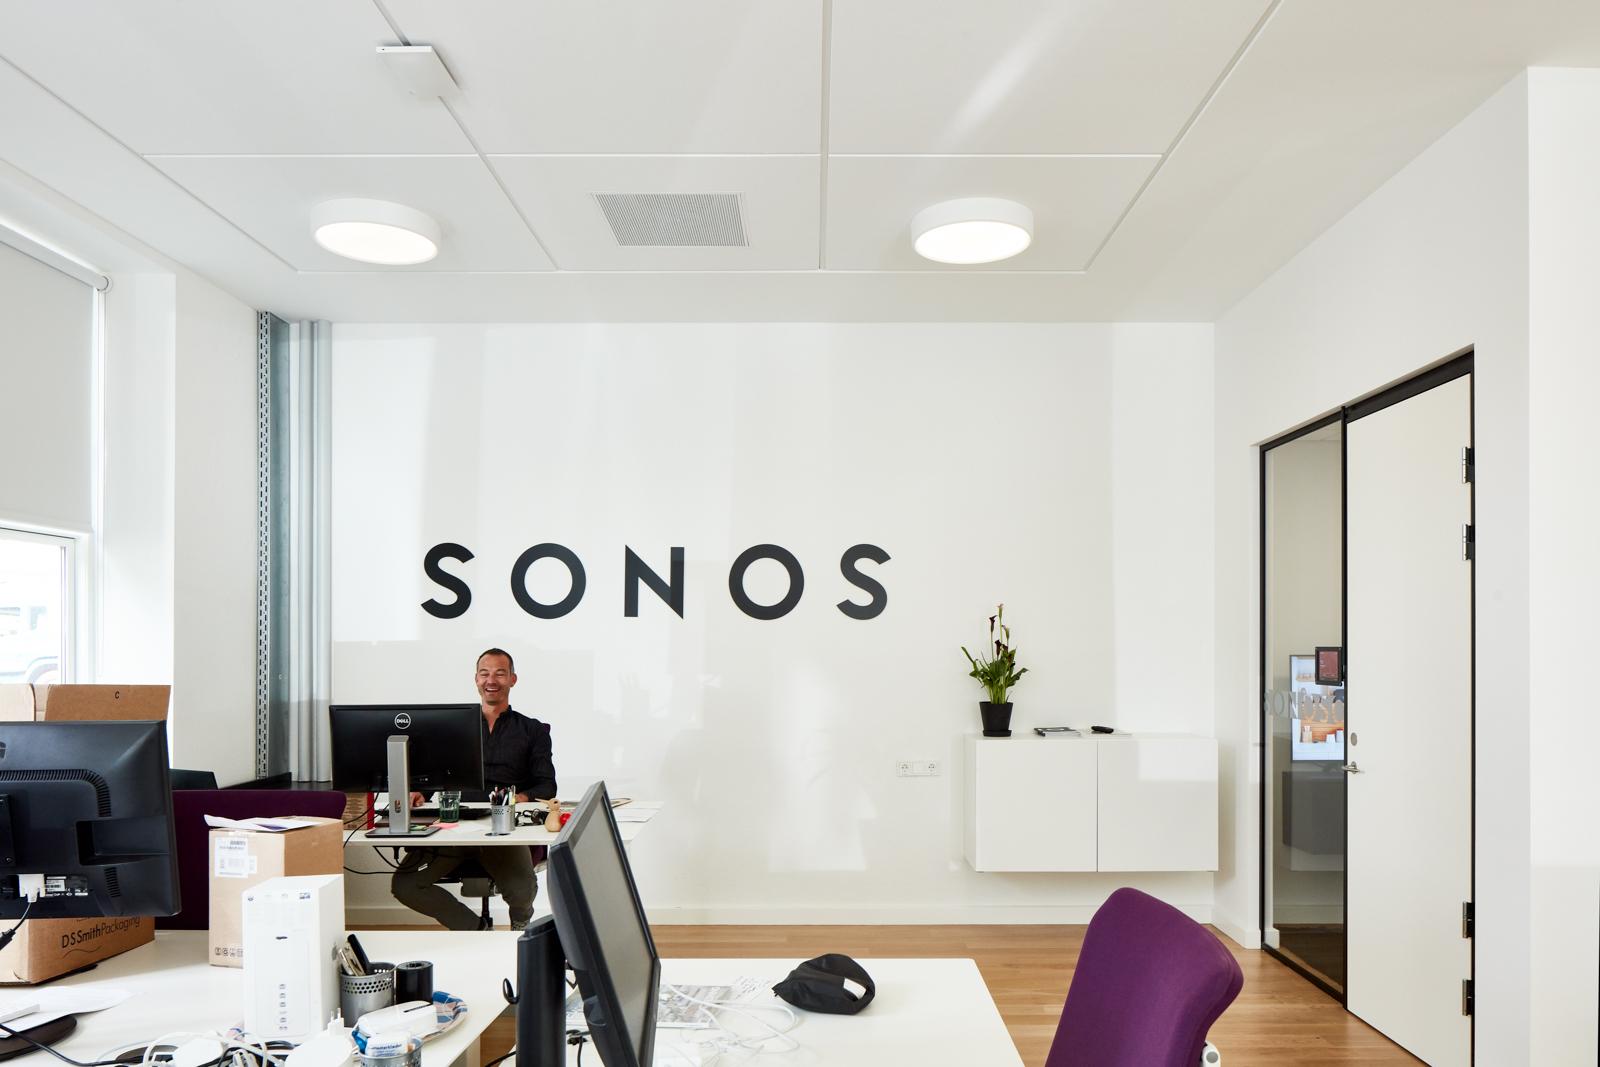 SONOS (kontor)